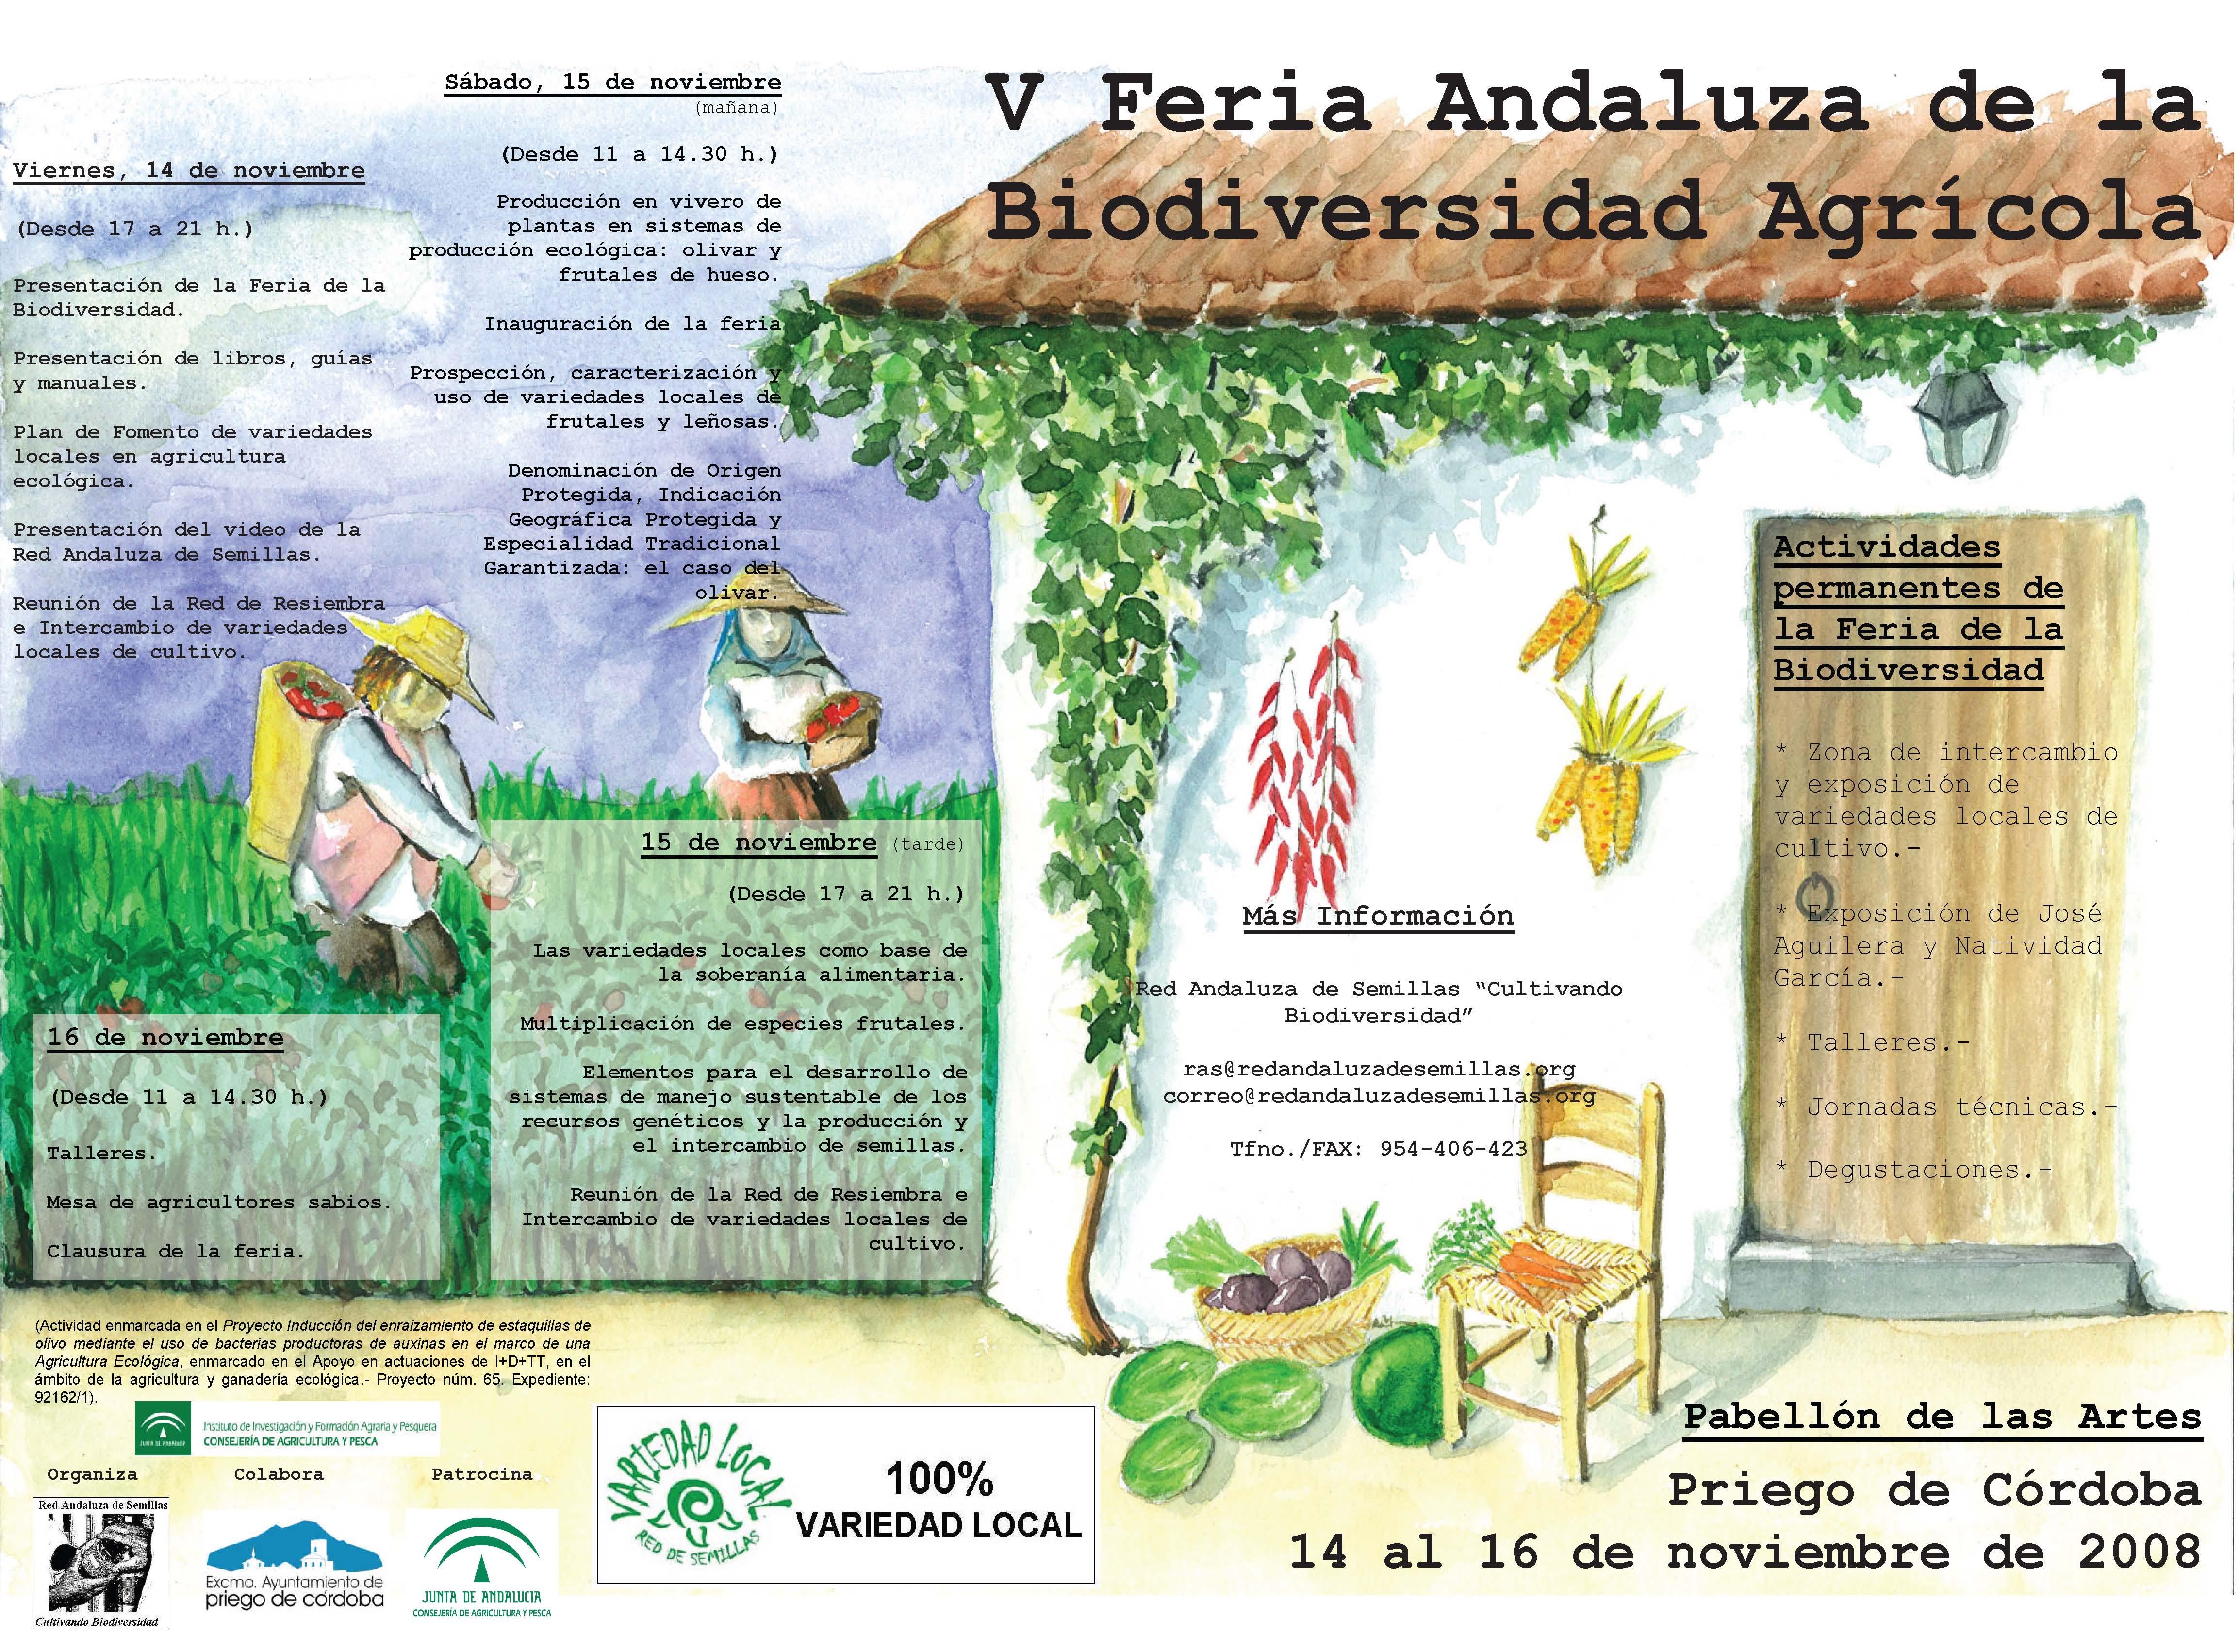 poster-vferia-andaluza-biodiversidad-agricola-priego-14-16nov08.jpg